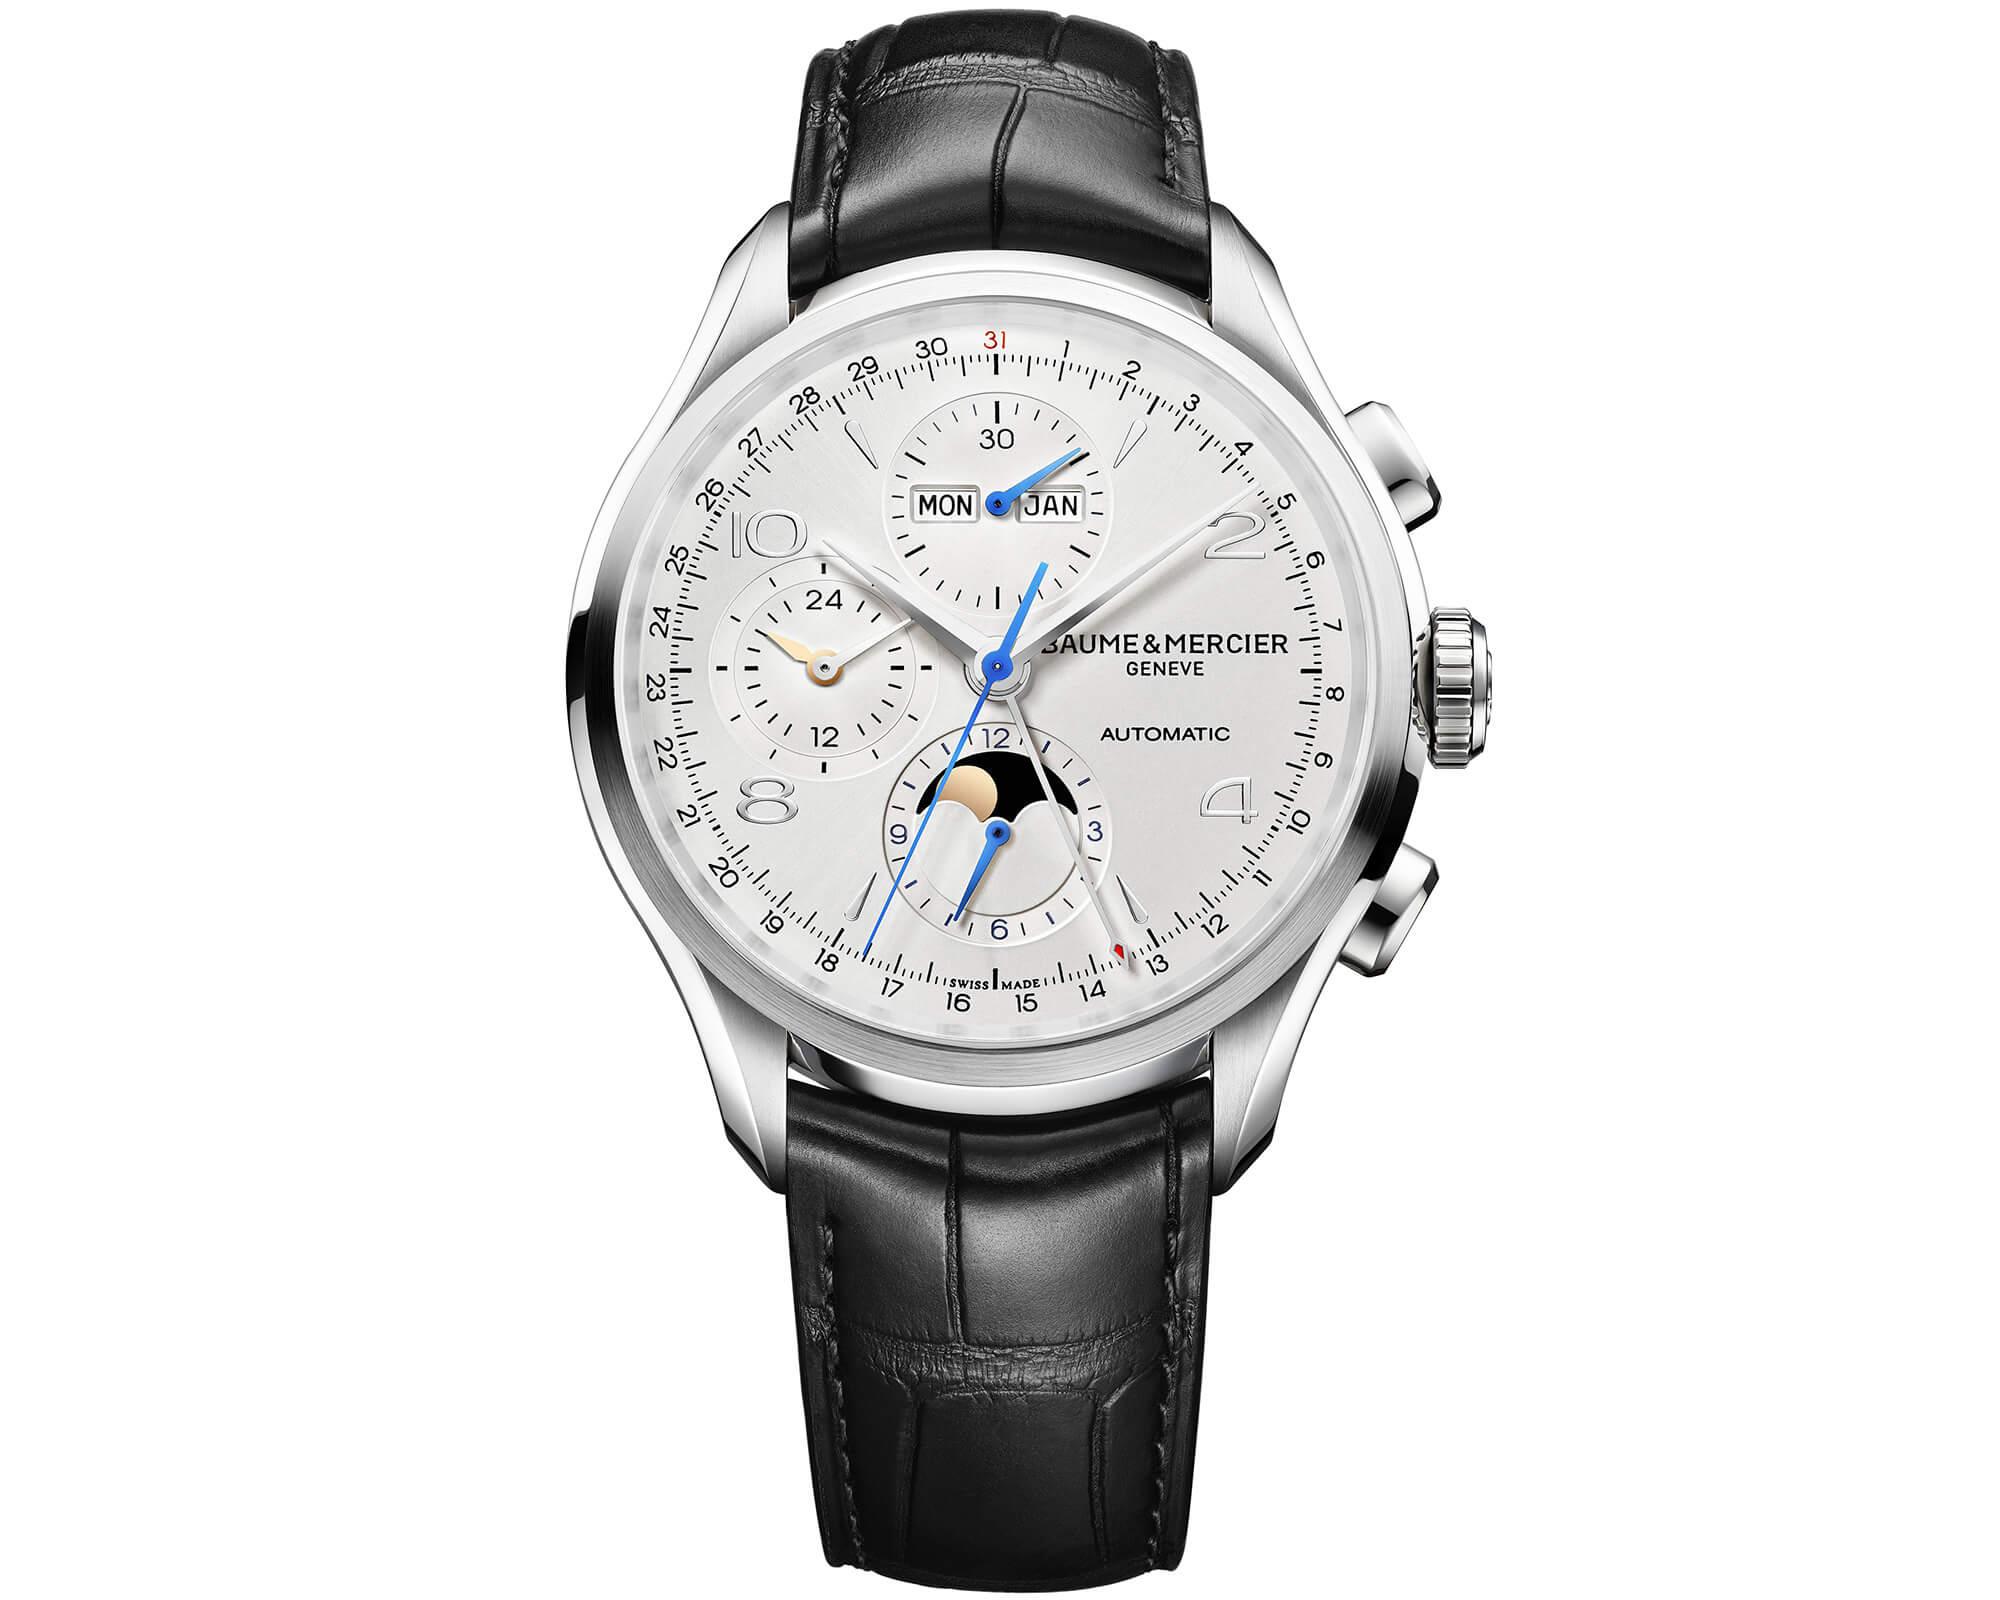 BM-Clifton-Chronographe-Calendrier-Complet